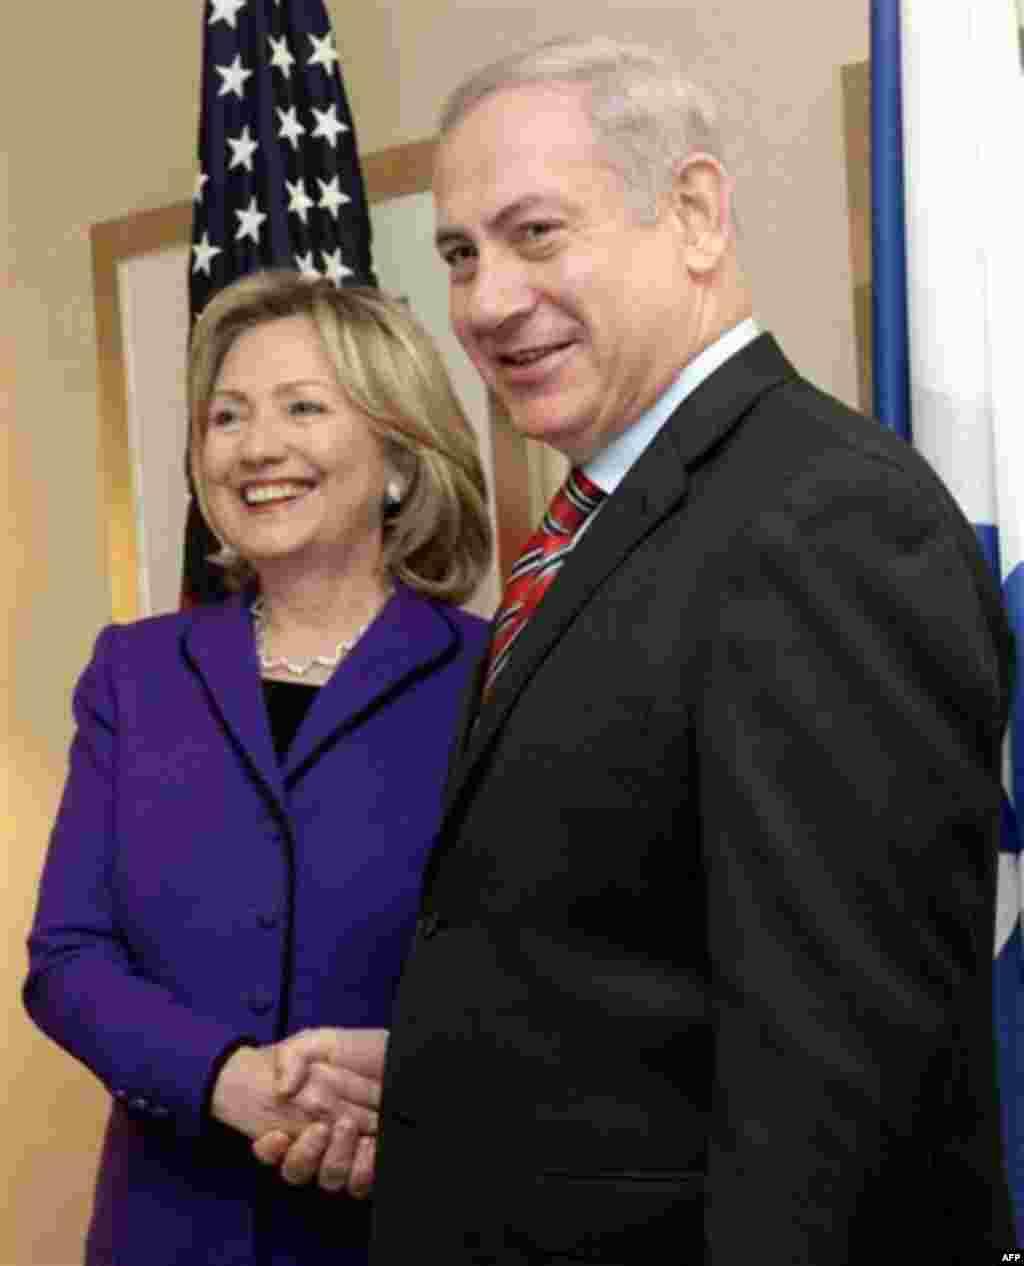 U.S. Secretary of State Hillary Rodham Clinton, left, shakes hands with Israeli Prime Minister Benjamin Netanyahu during their meeting Thursday, Nov. 11, 2010 in New York. (AP Photo/Mary Altaffer)